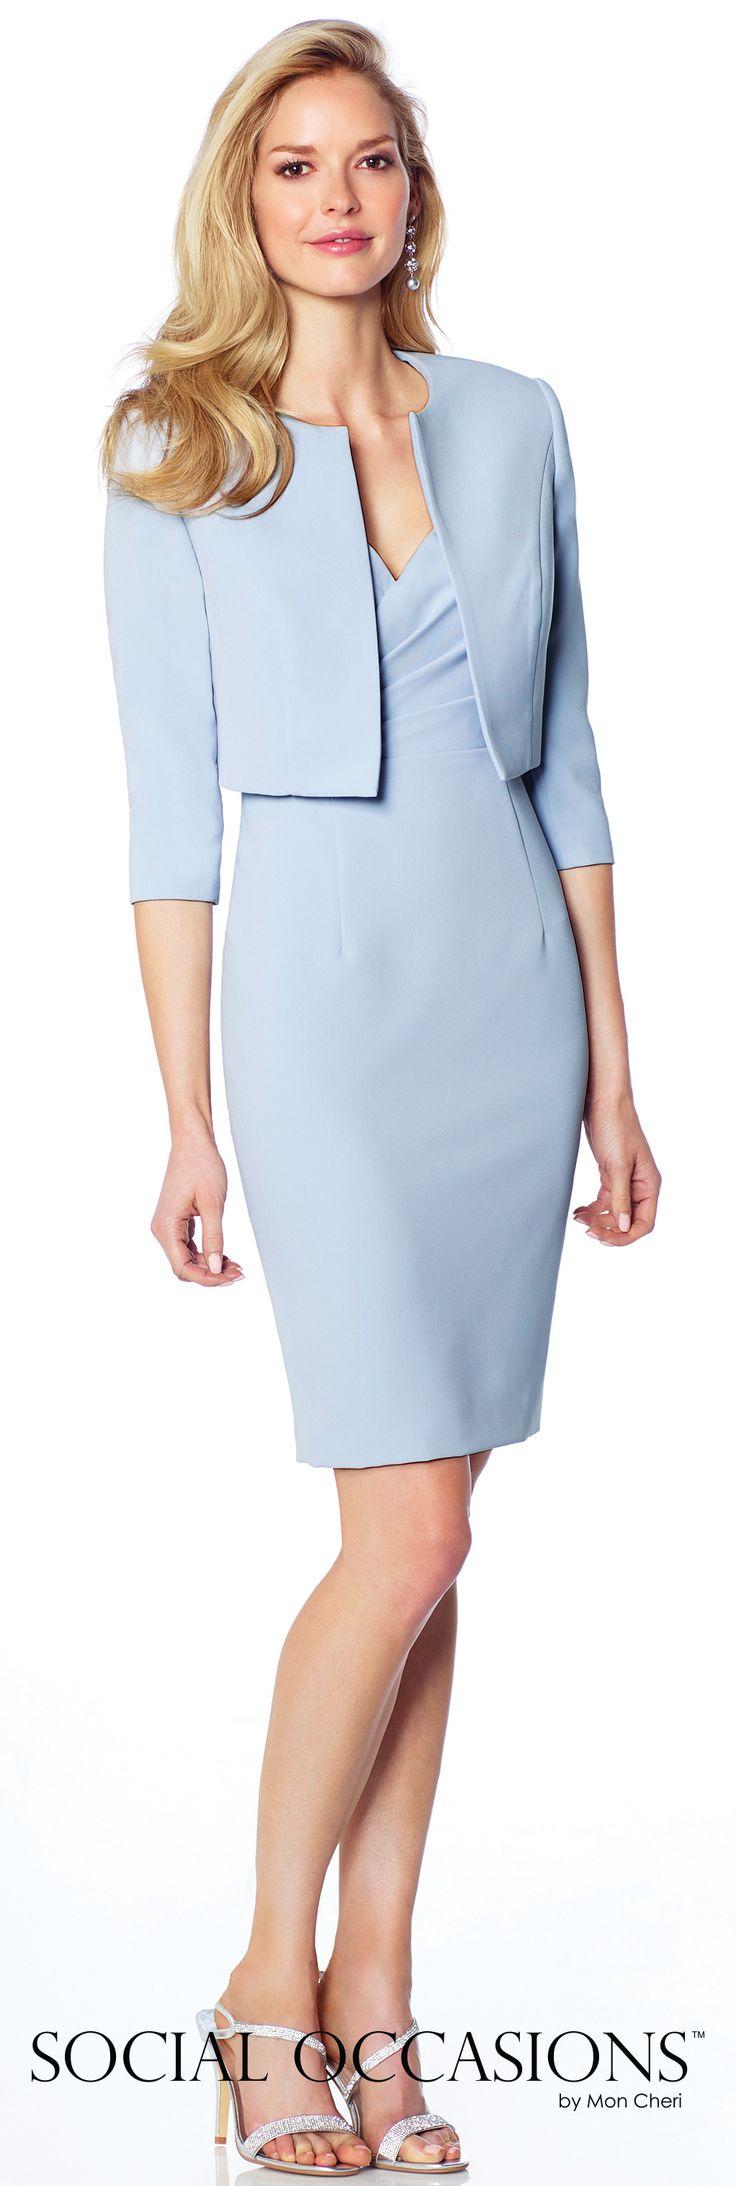 1000  ideas about Short Evening Dresses on Pinterest - Dresses for ...